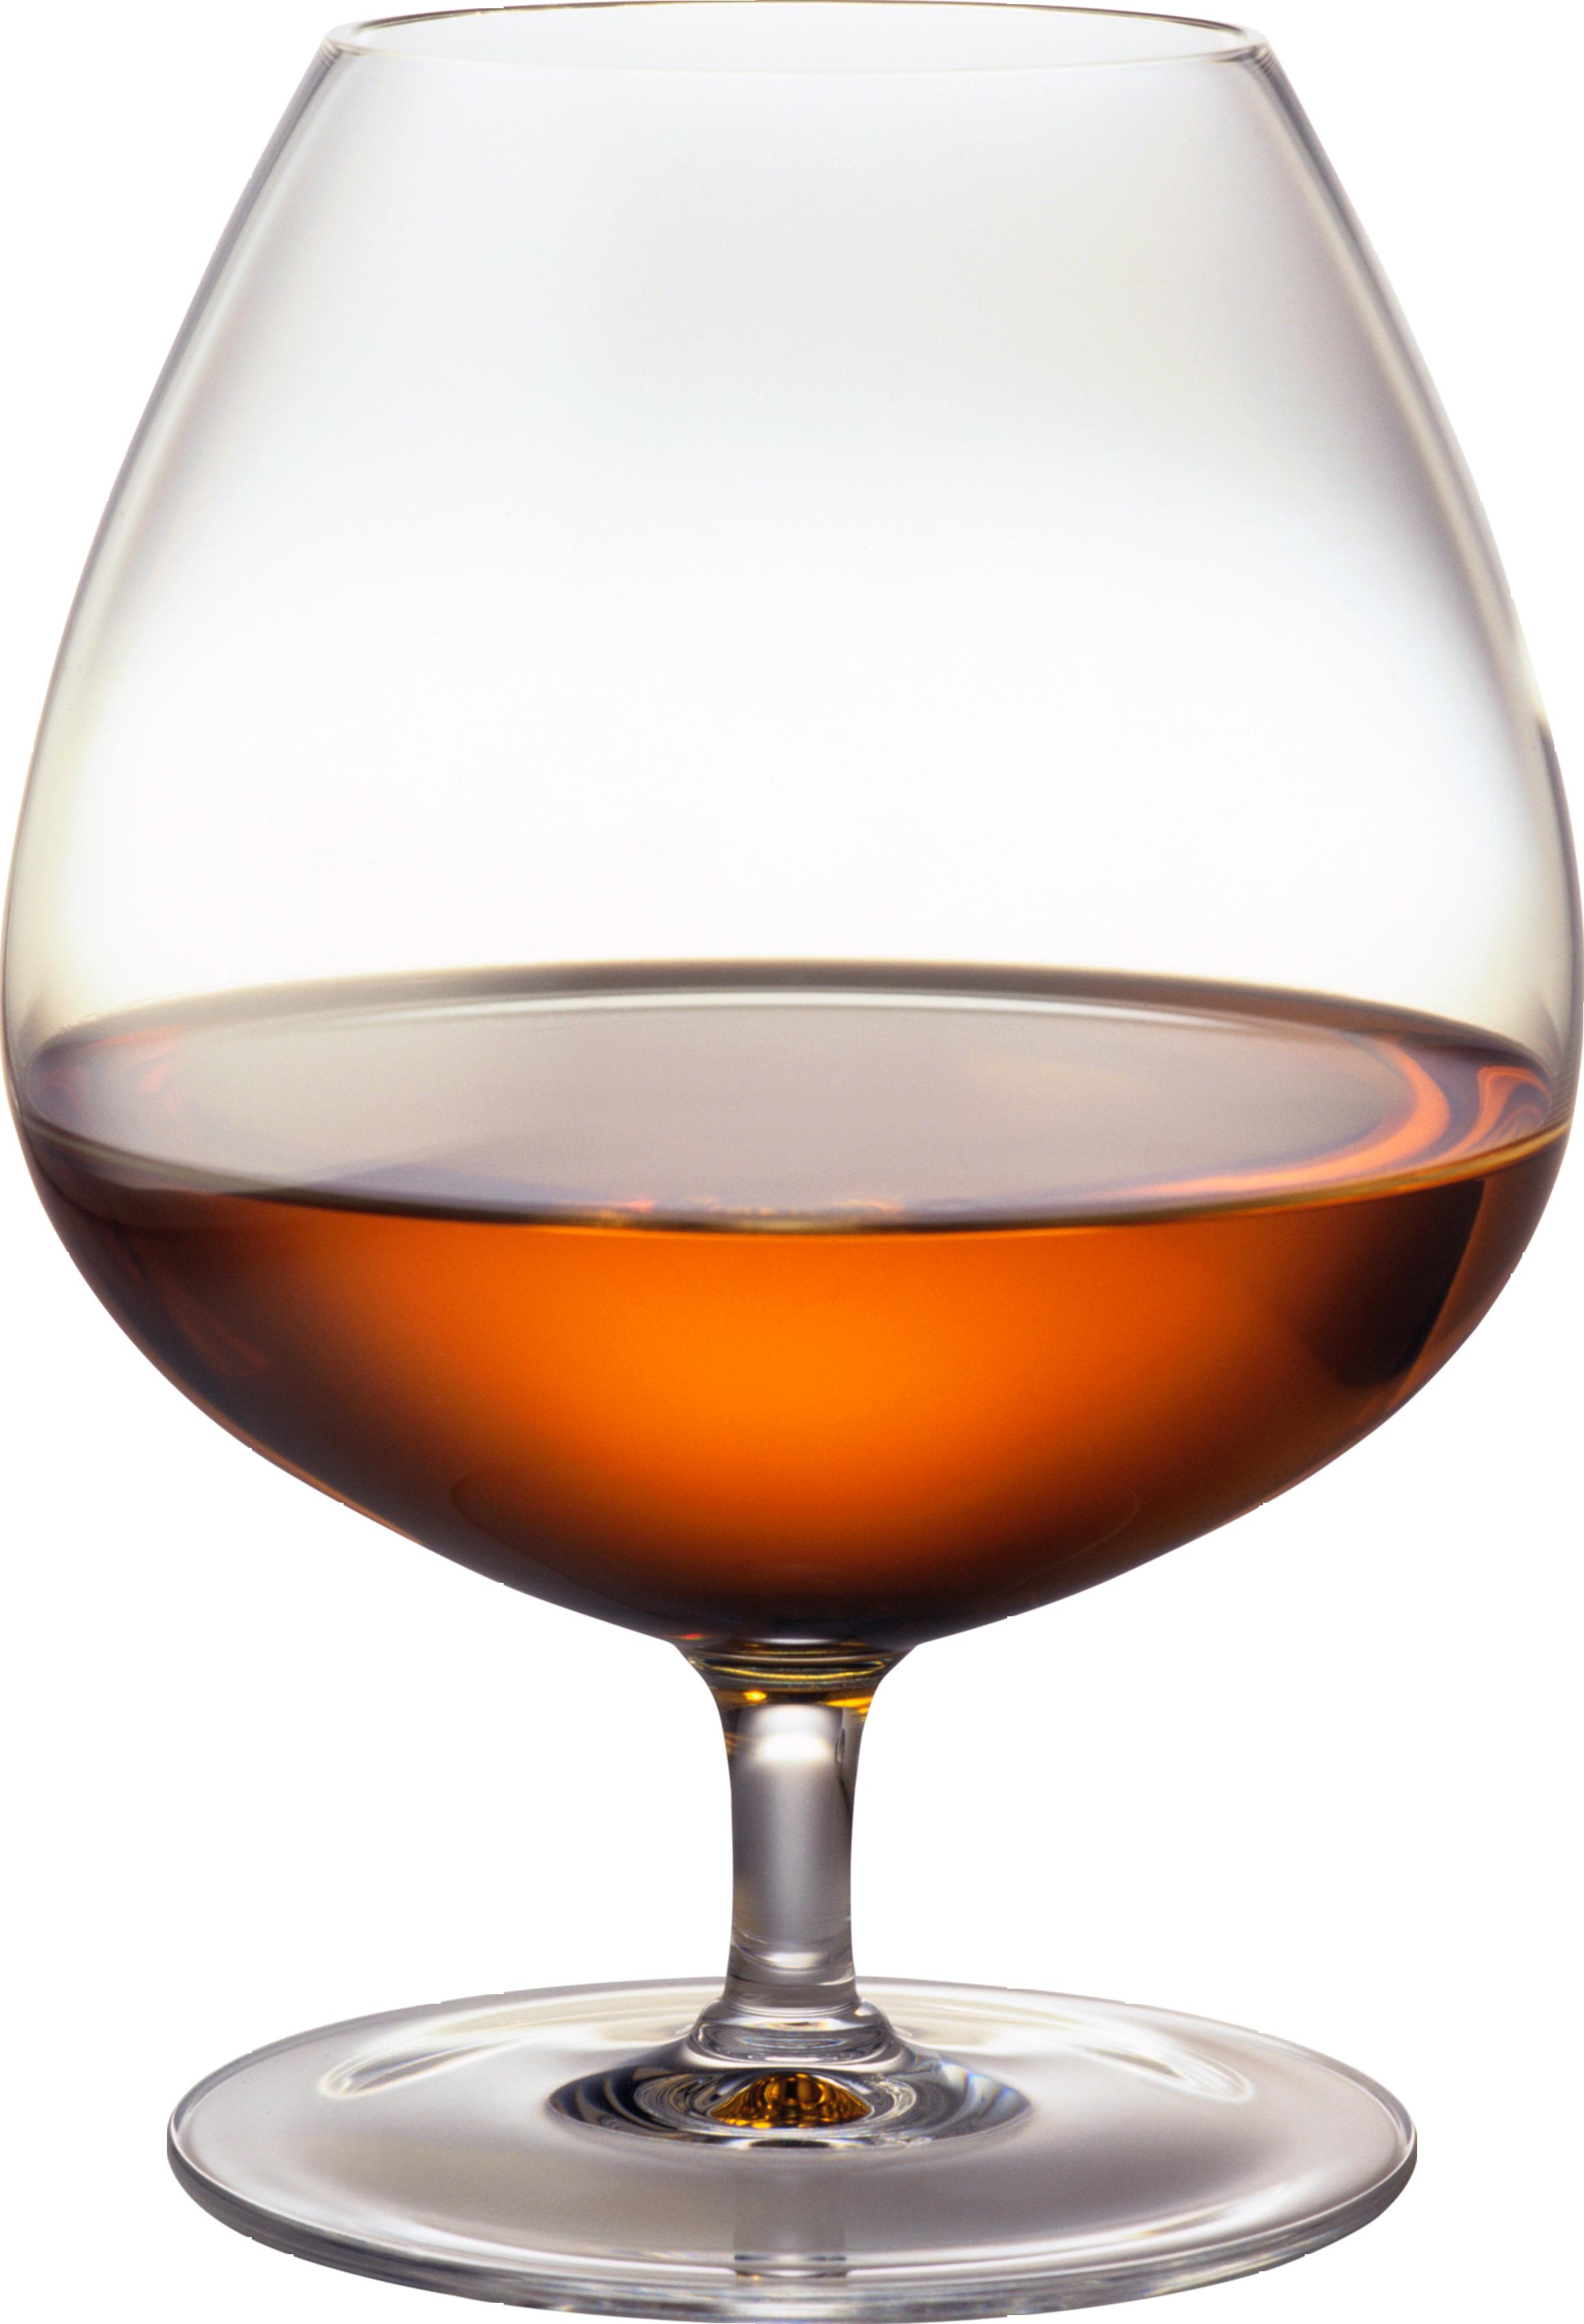 Cognac glass PNG